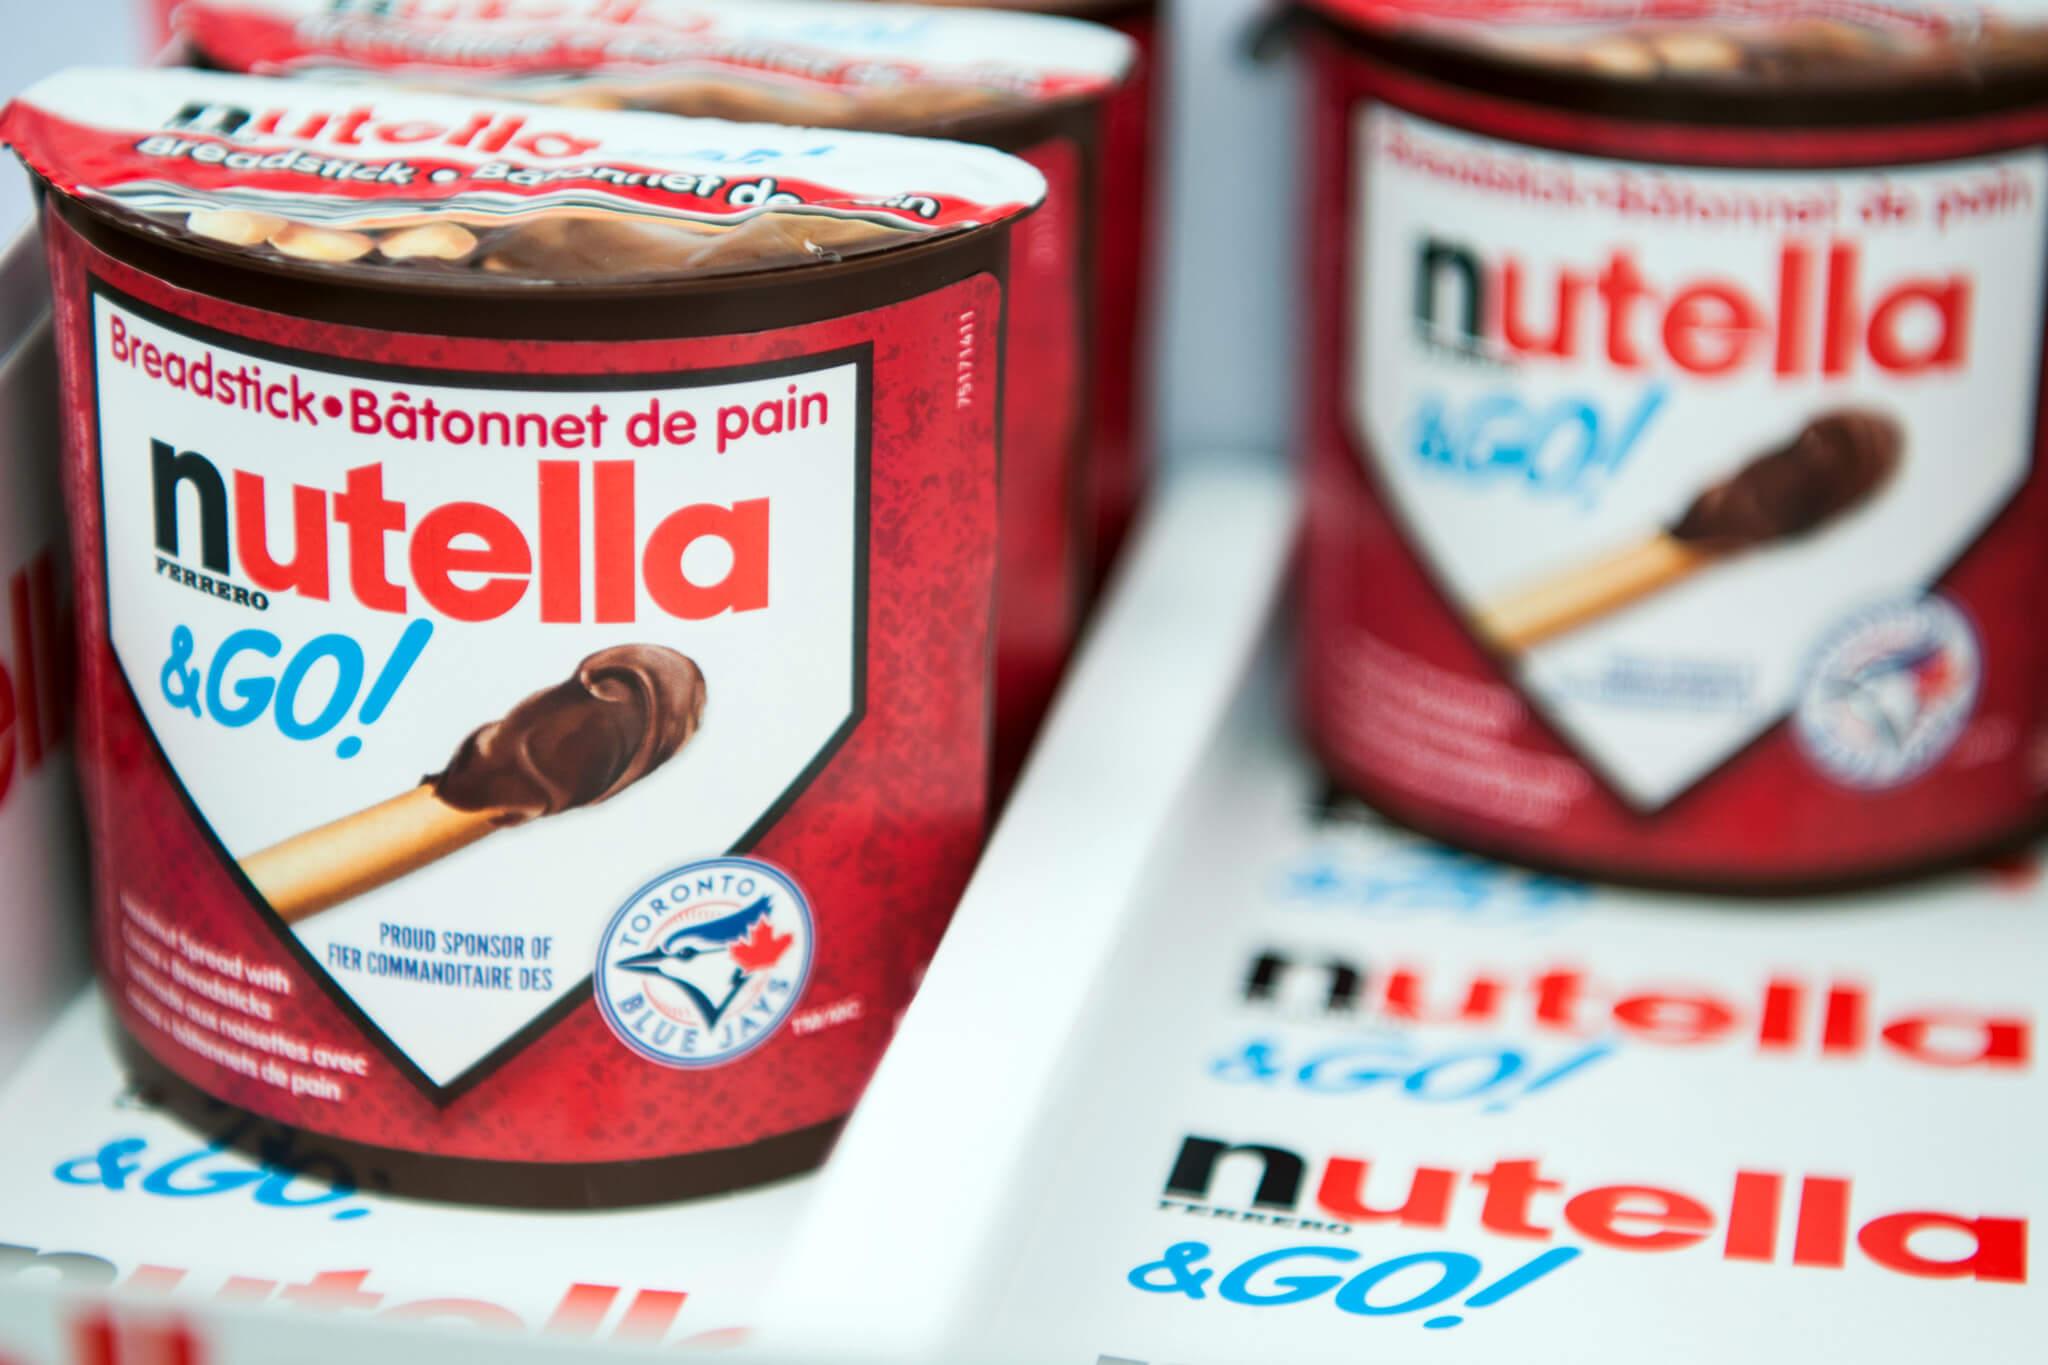 Authentic Italian Table Vancouver Nutella